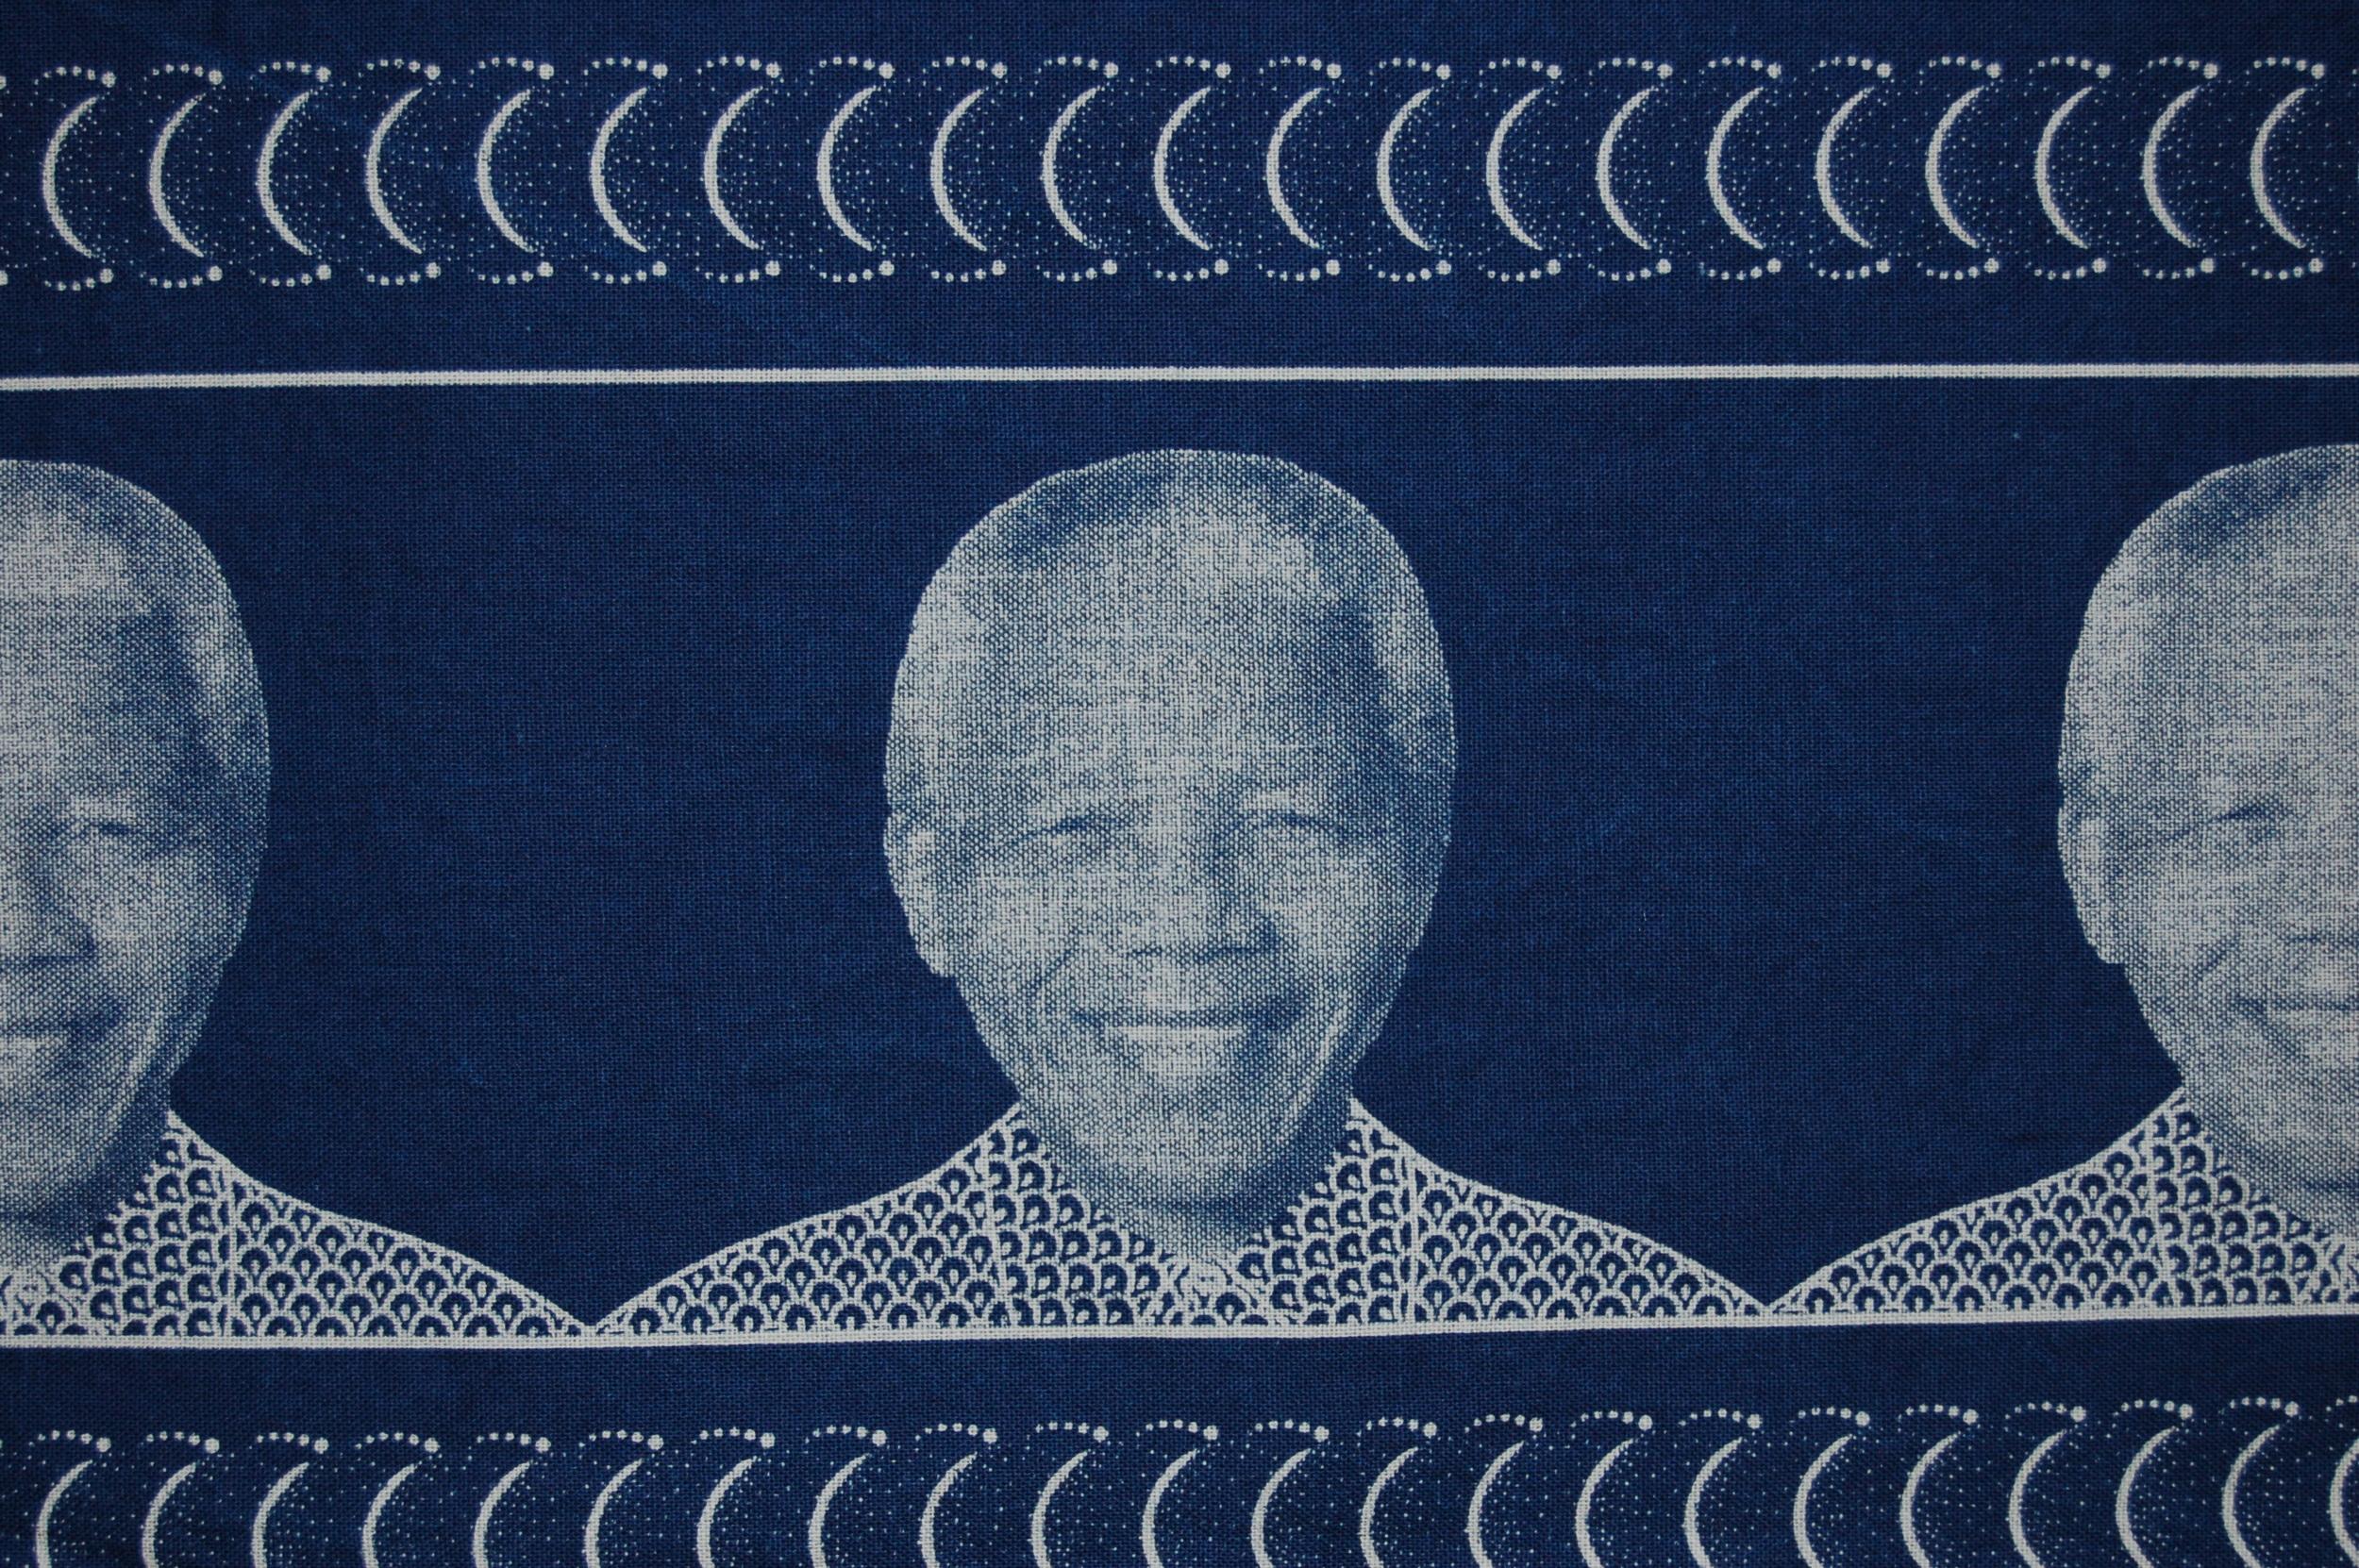 Nelson Mandela capulana, 2008, copyright: Trustees of the British Museum